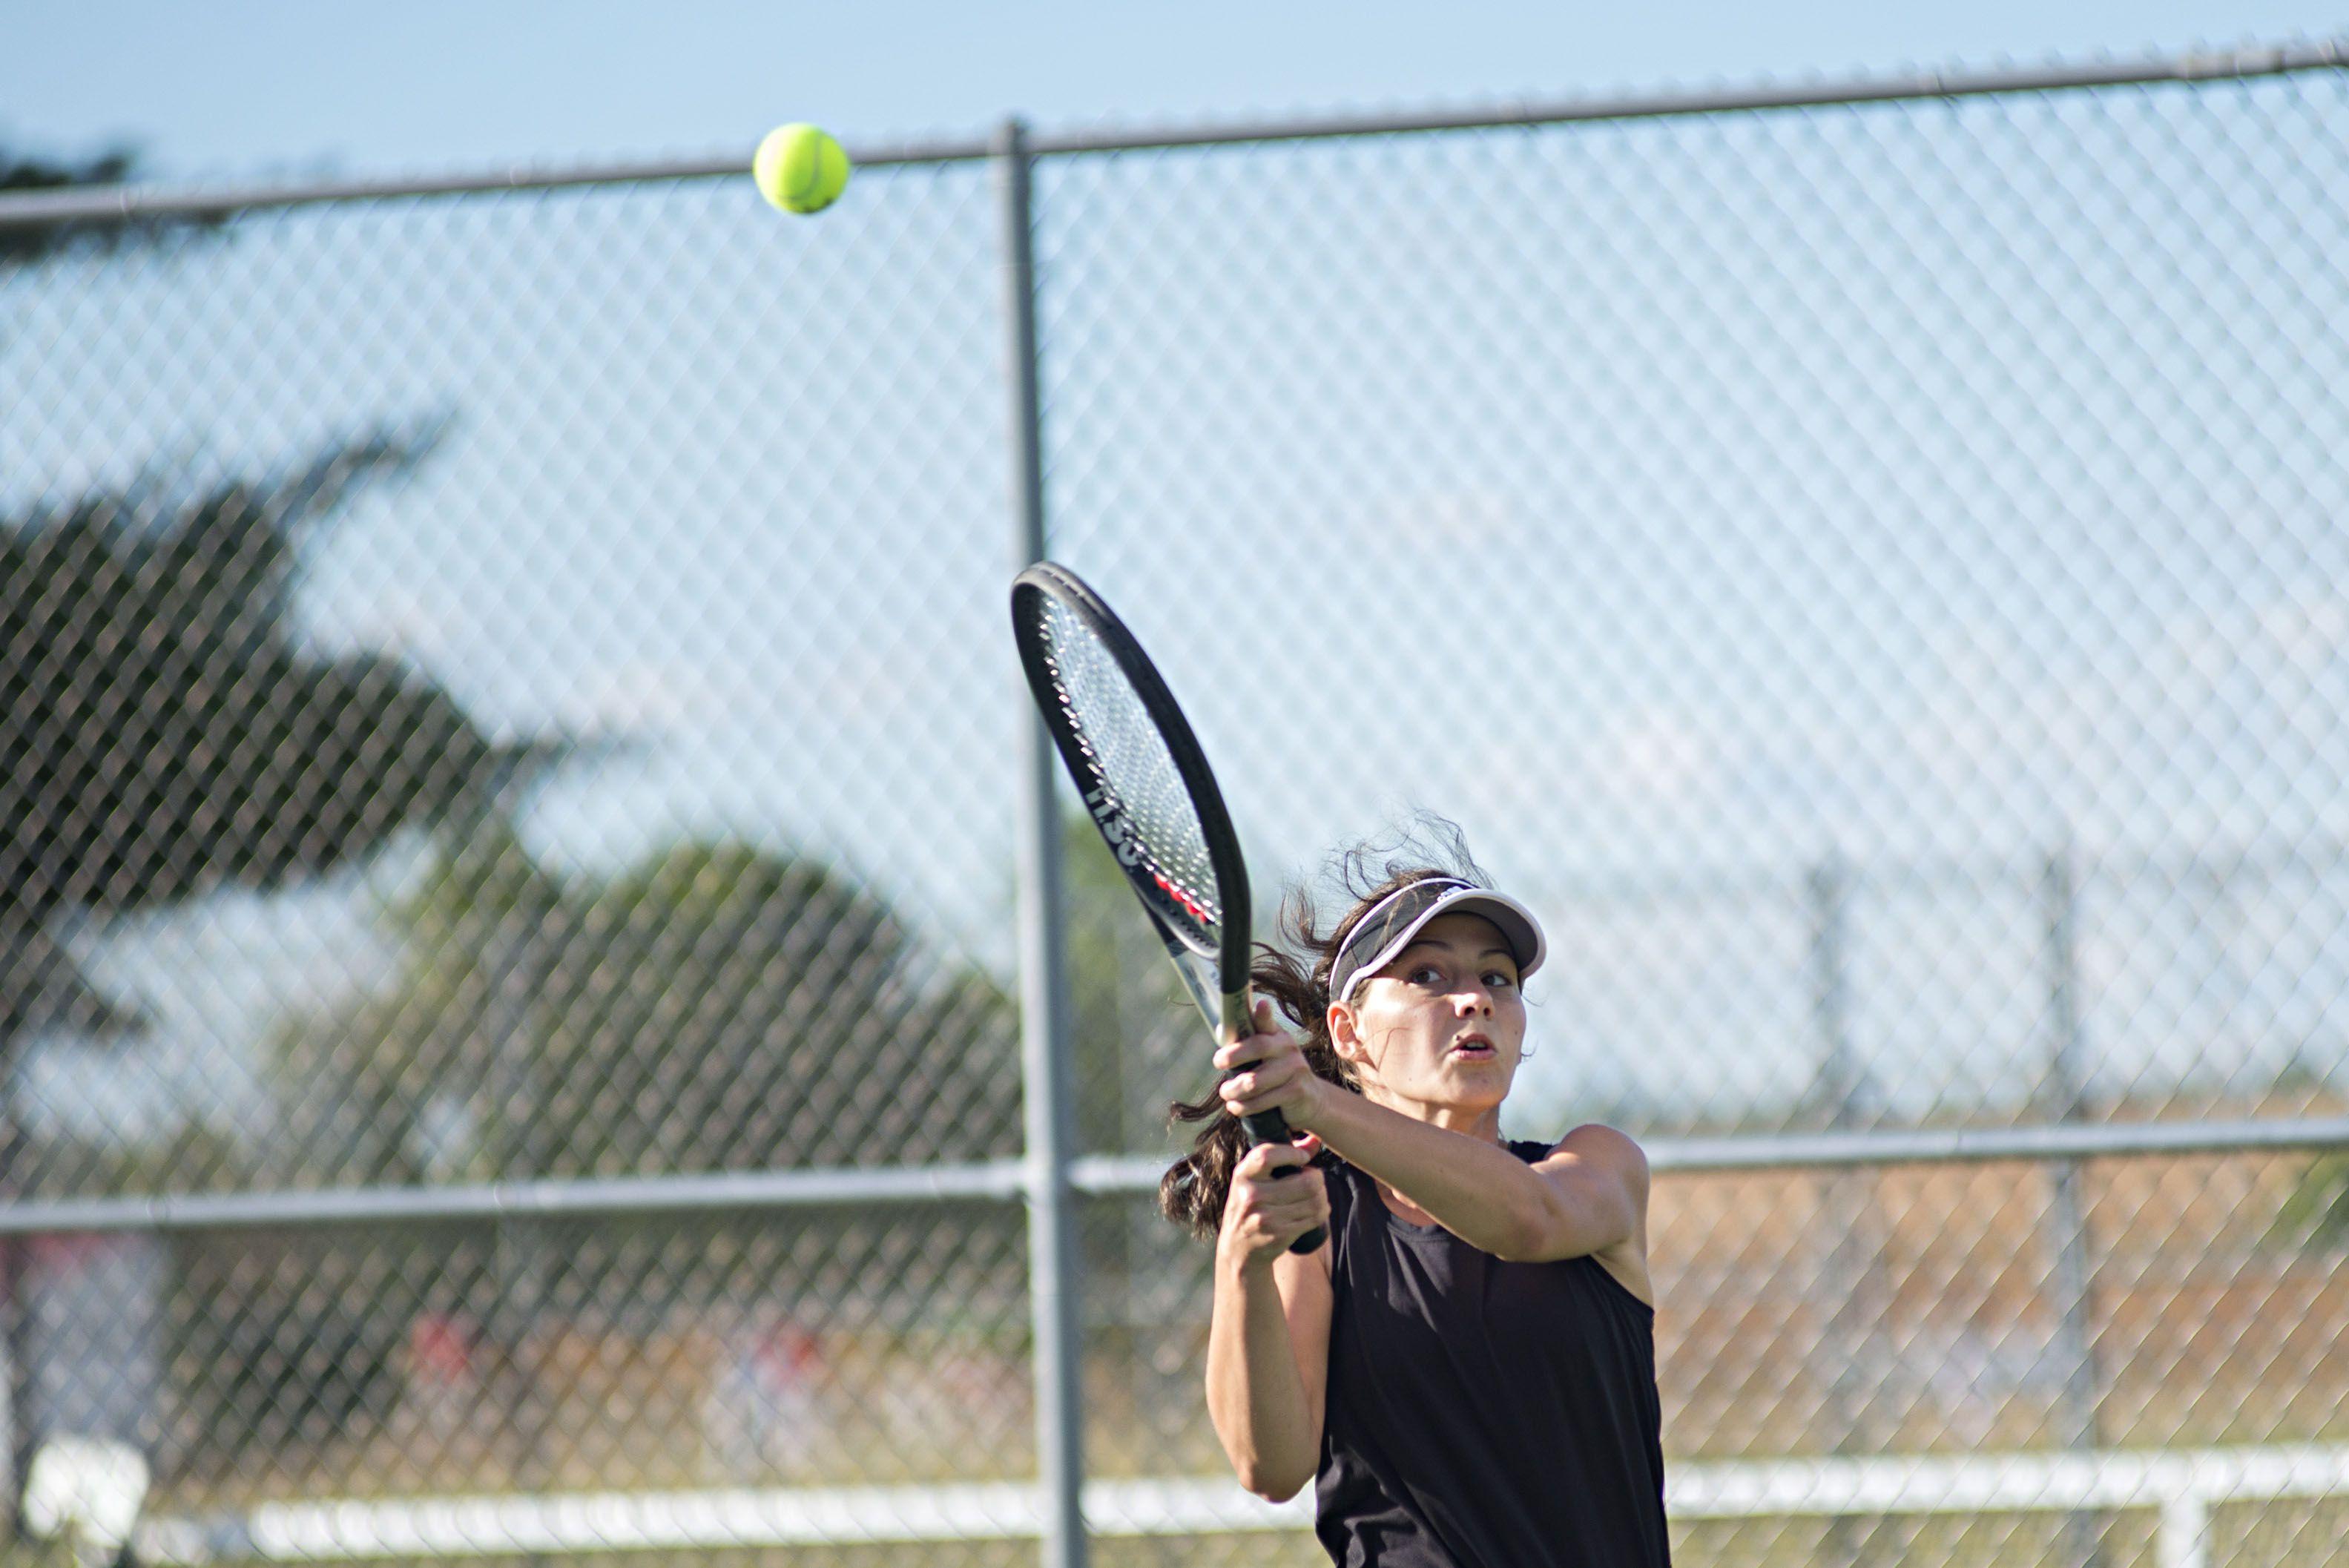 Area roundup: Sauk Valley women's tennis stays undefeated; Fulton boys win NUIC golf title